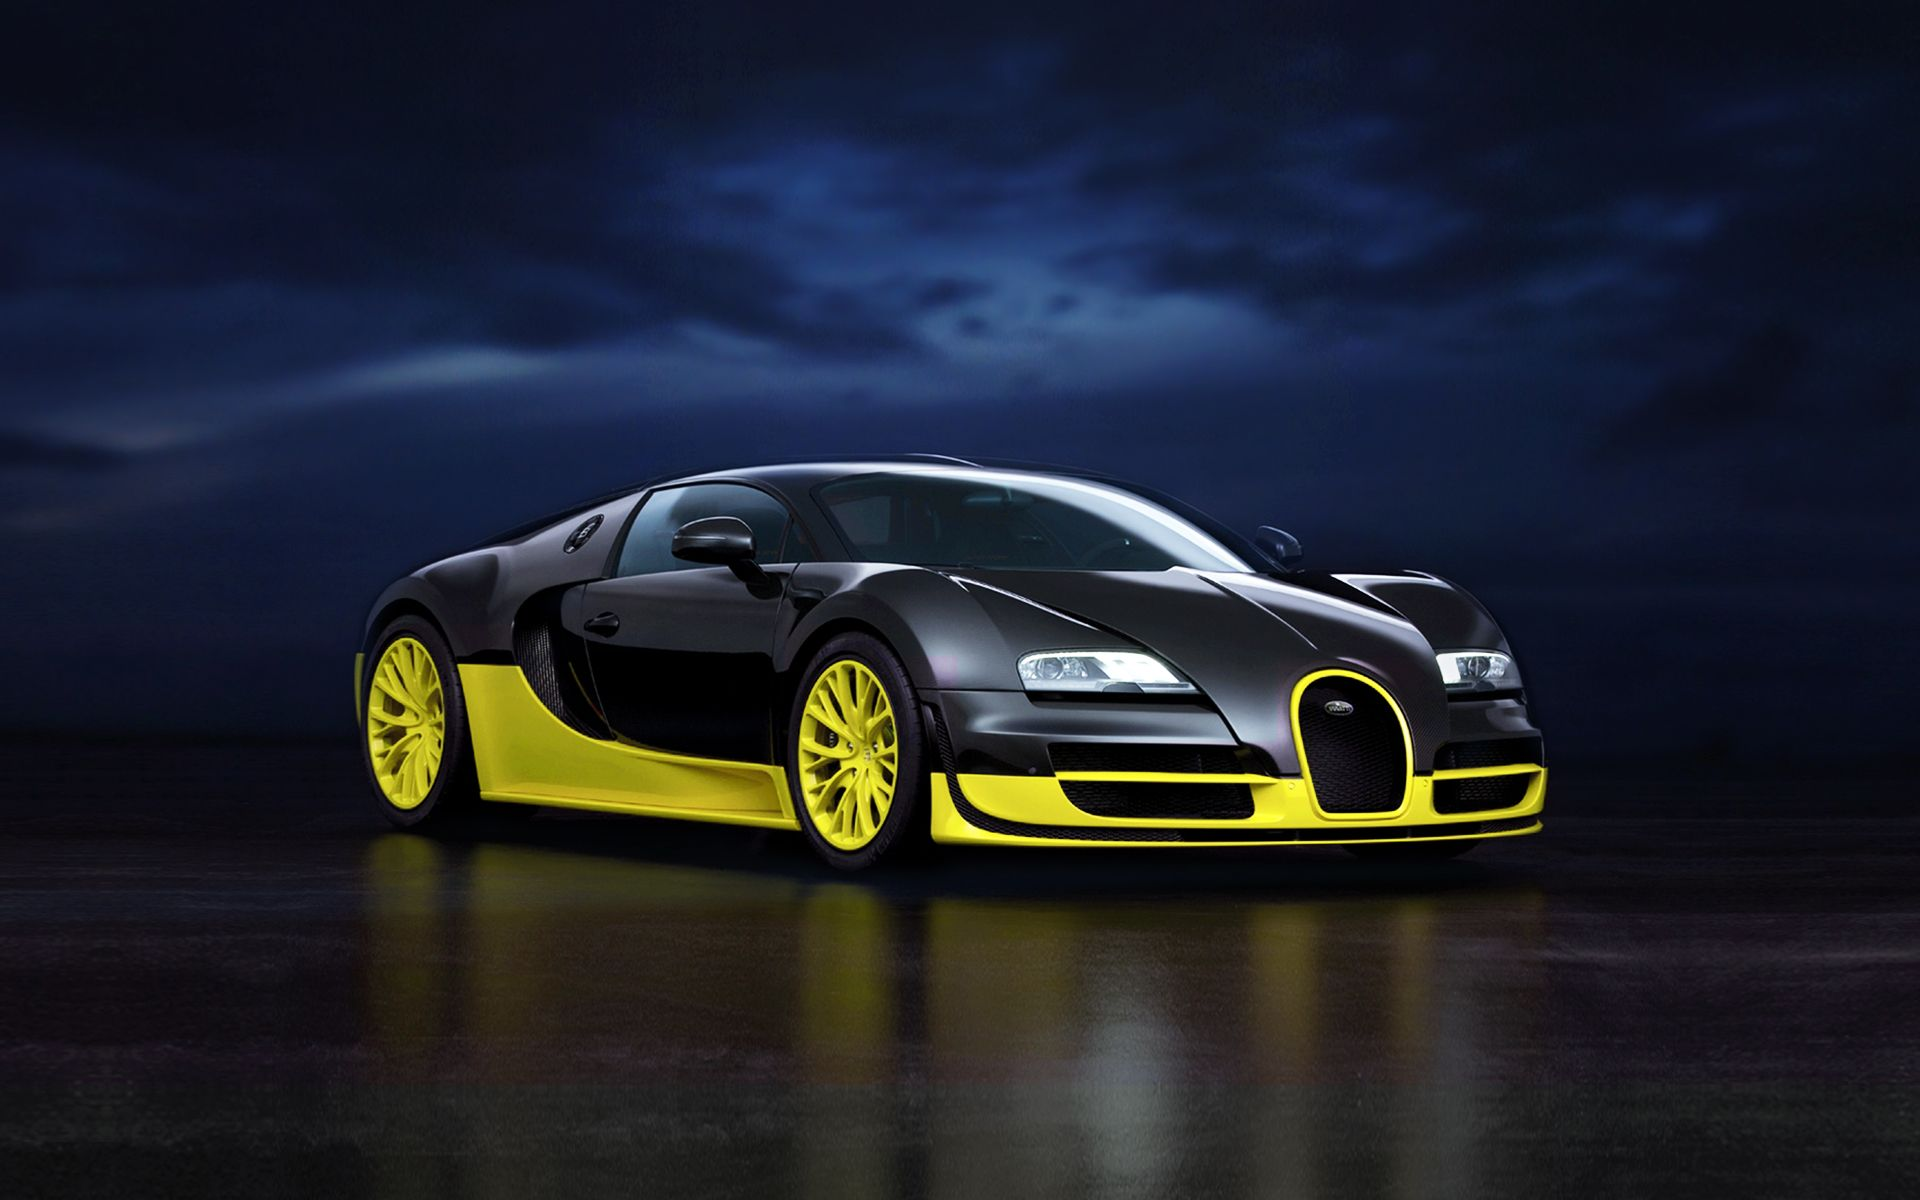 bugatti veyron ss wheels of distinction pinterest. Black Bedroom Furniture Sets. Home Design Ideas